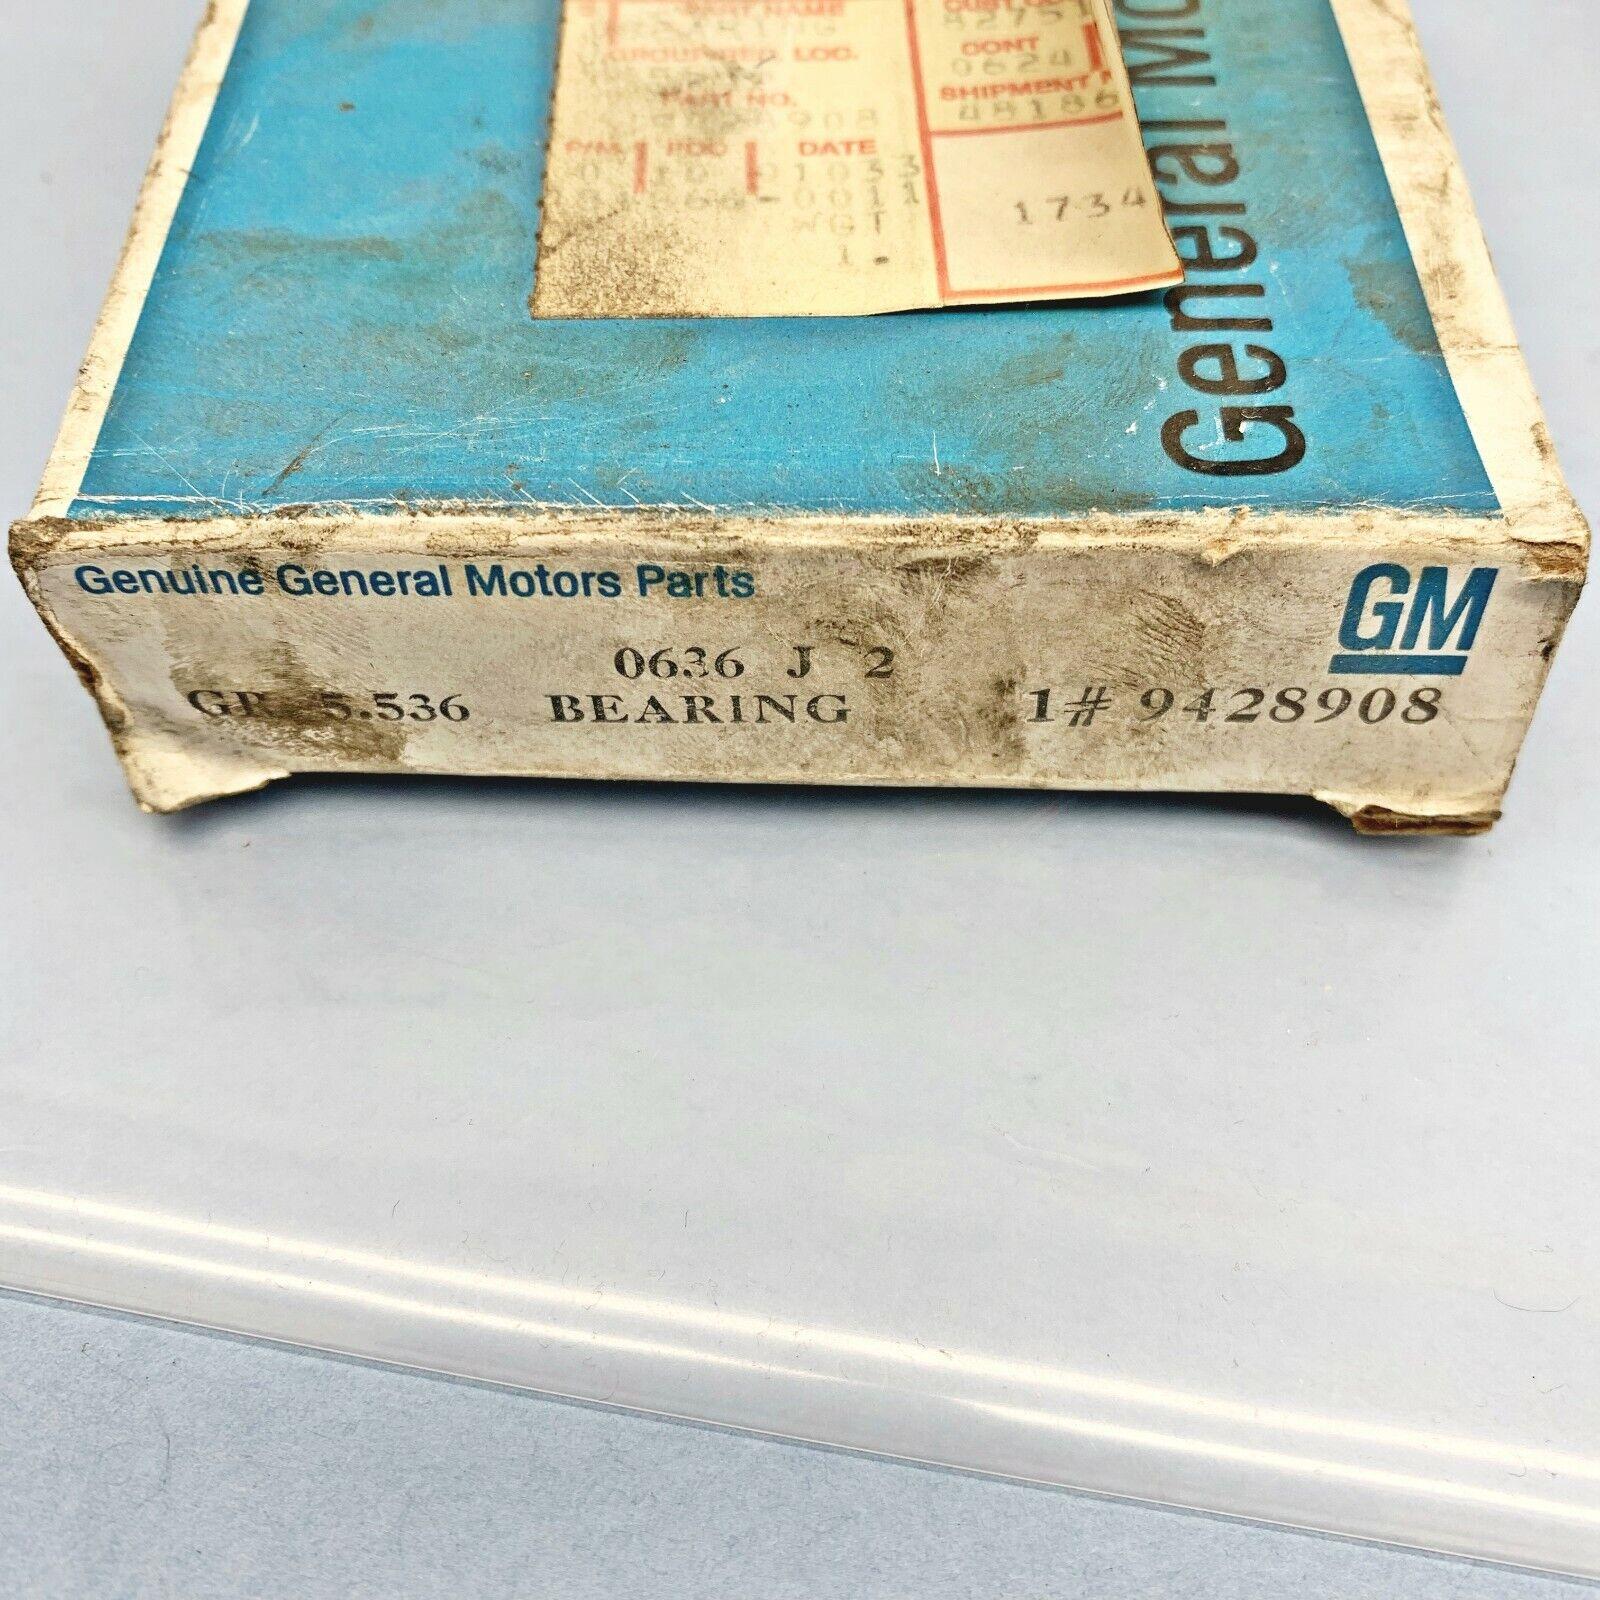 Genuine GM 9428908 Wheel Bearing